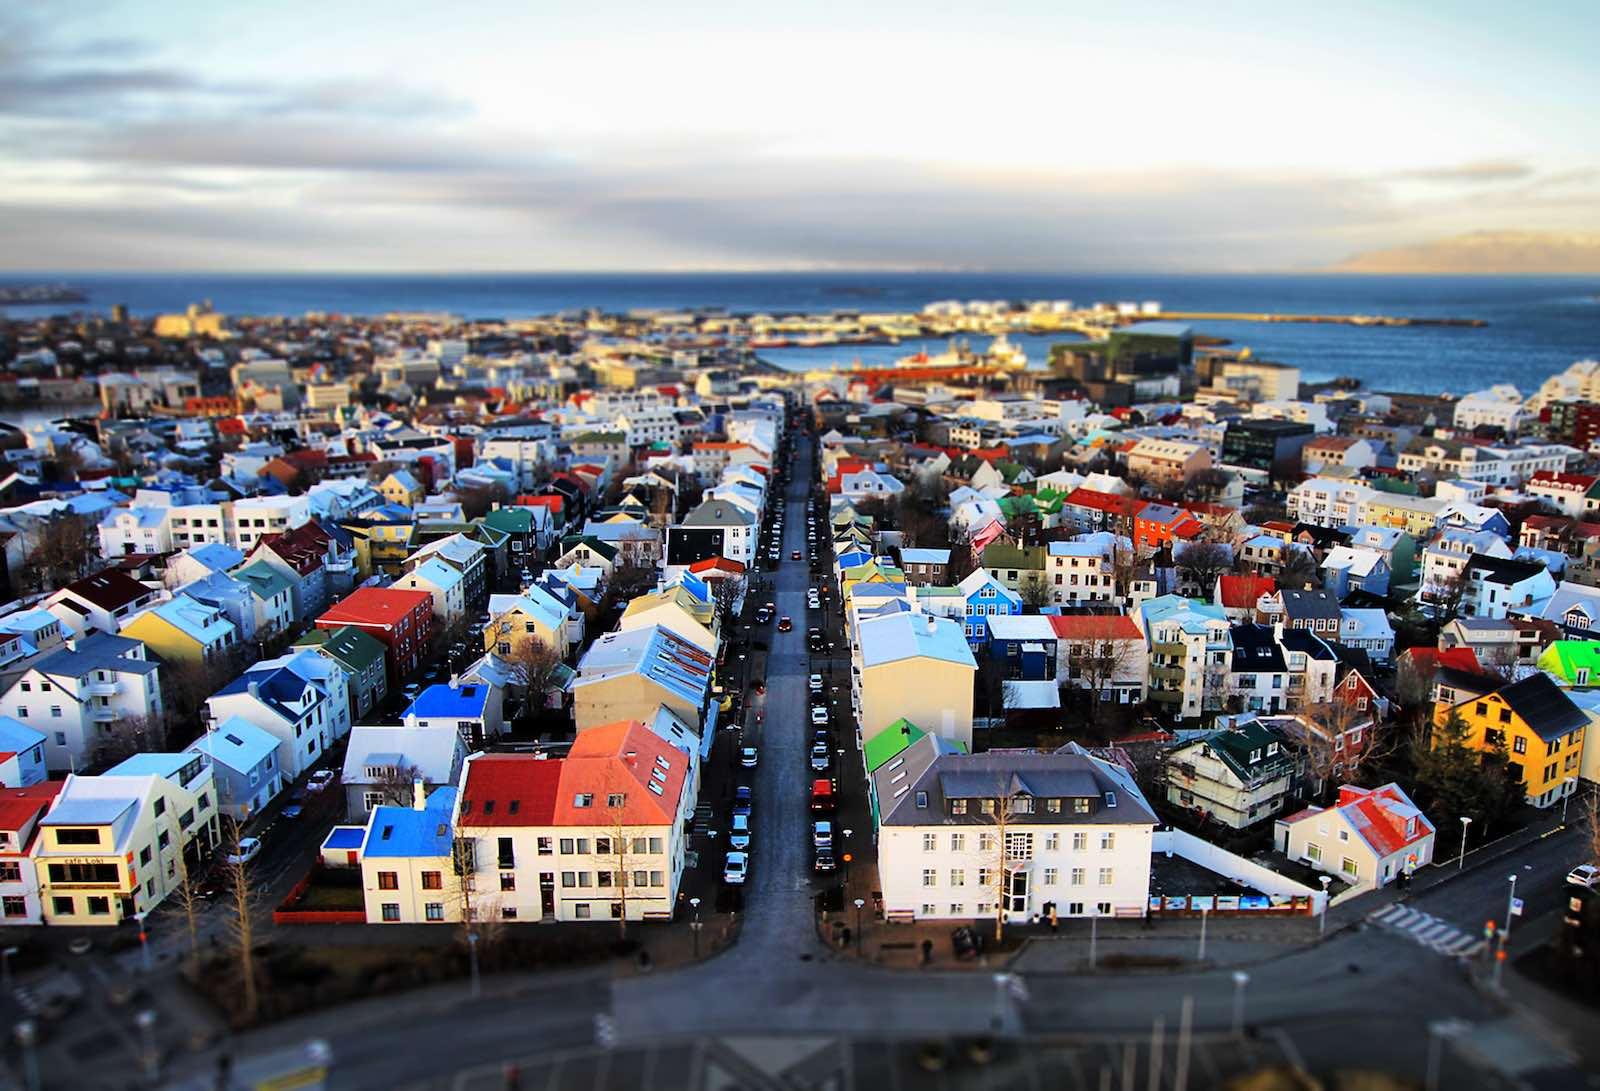 Reykjavik, Iceland (L. Toshio Kishiyama/Getty Images)